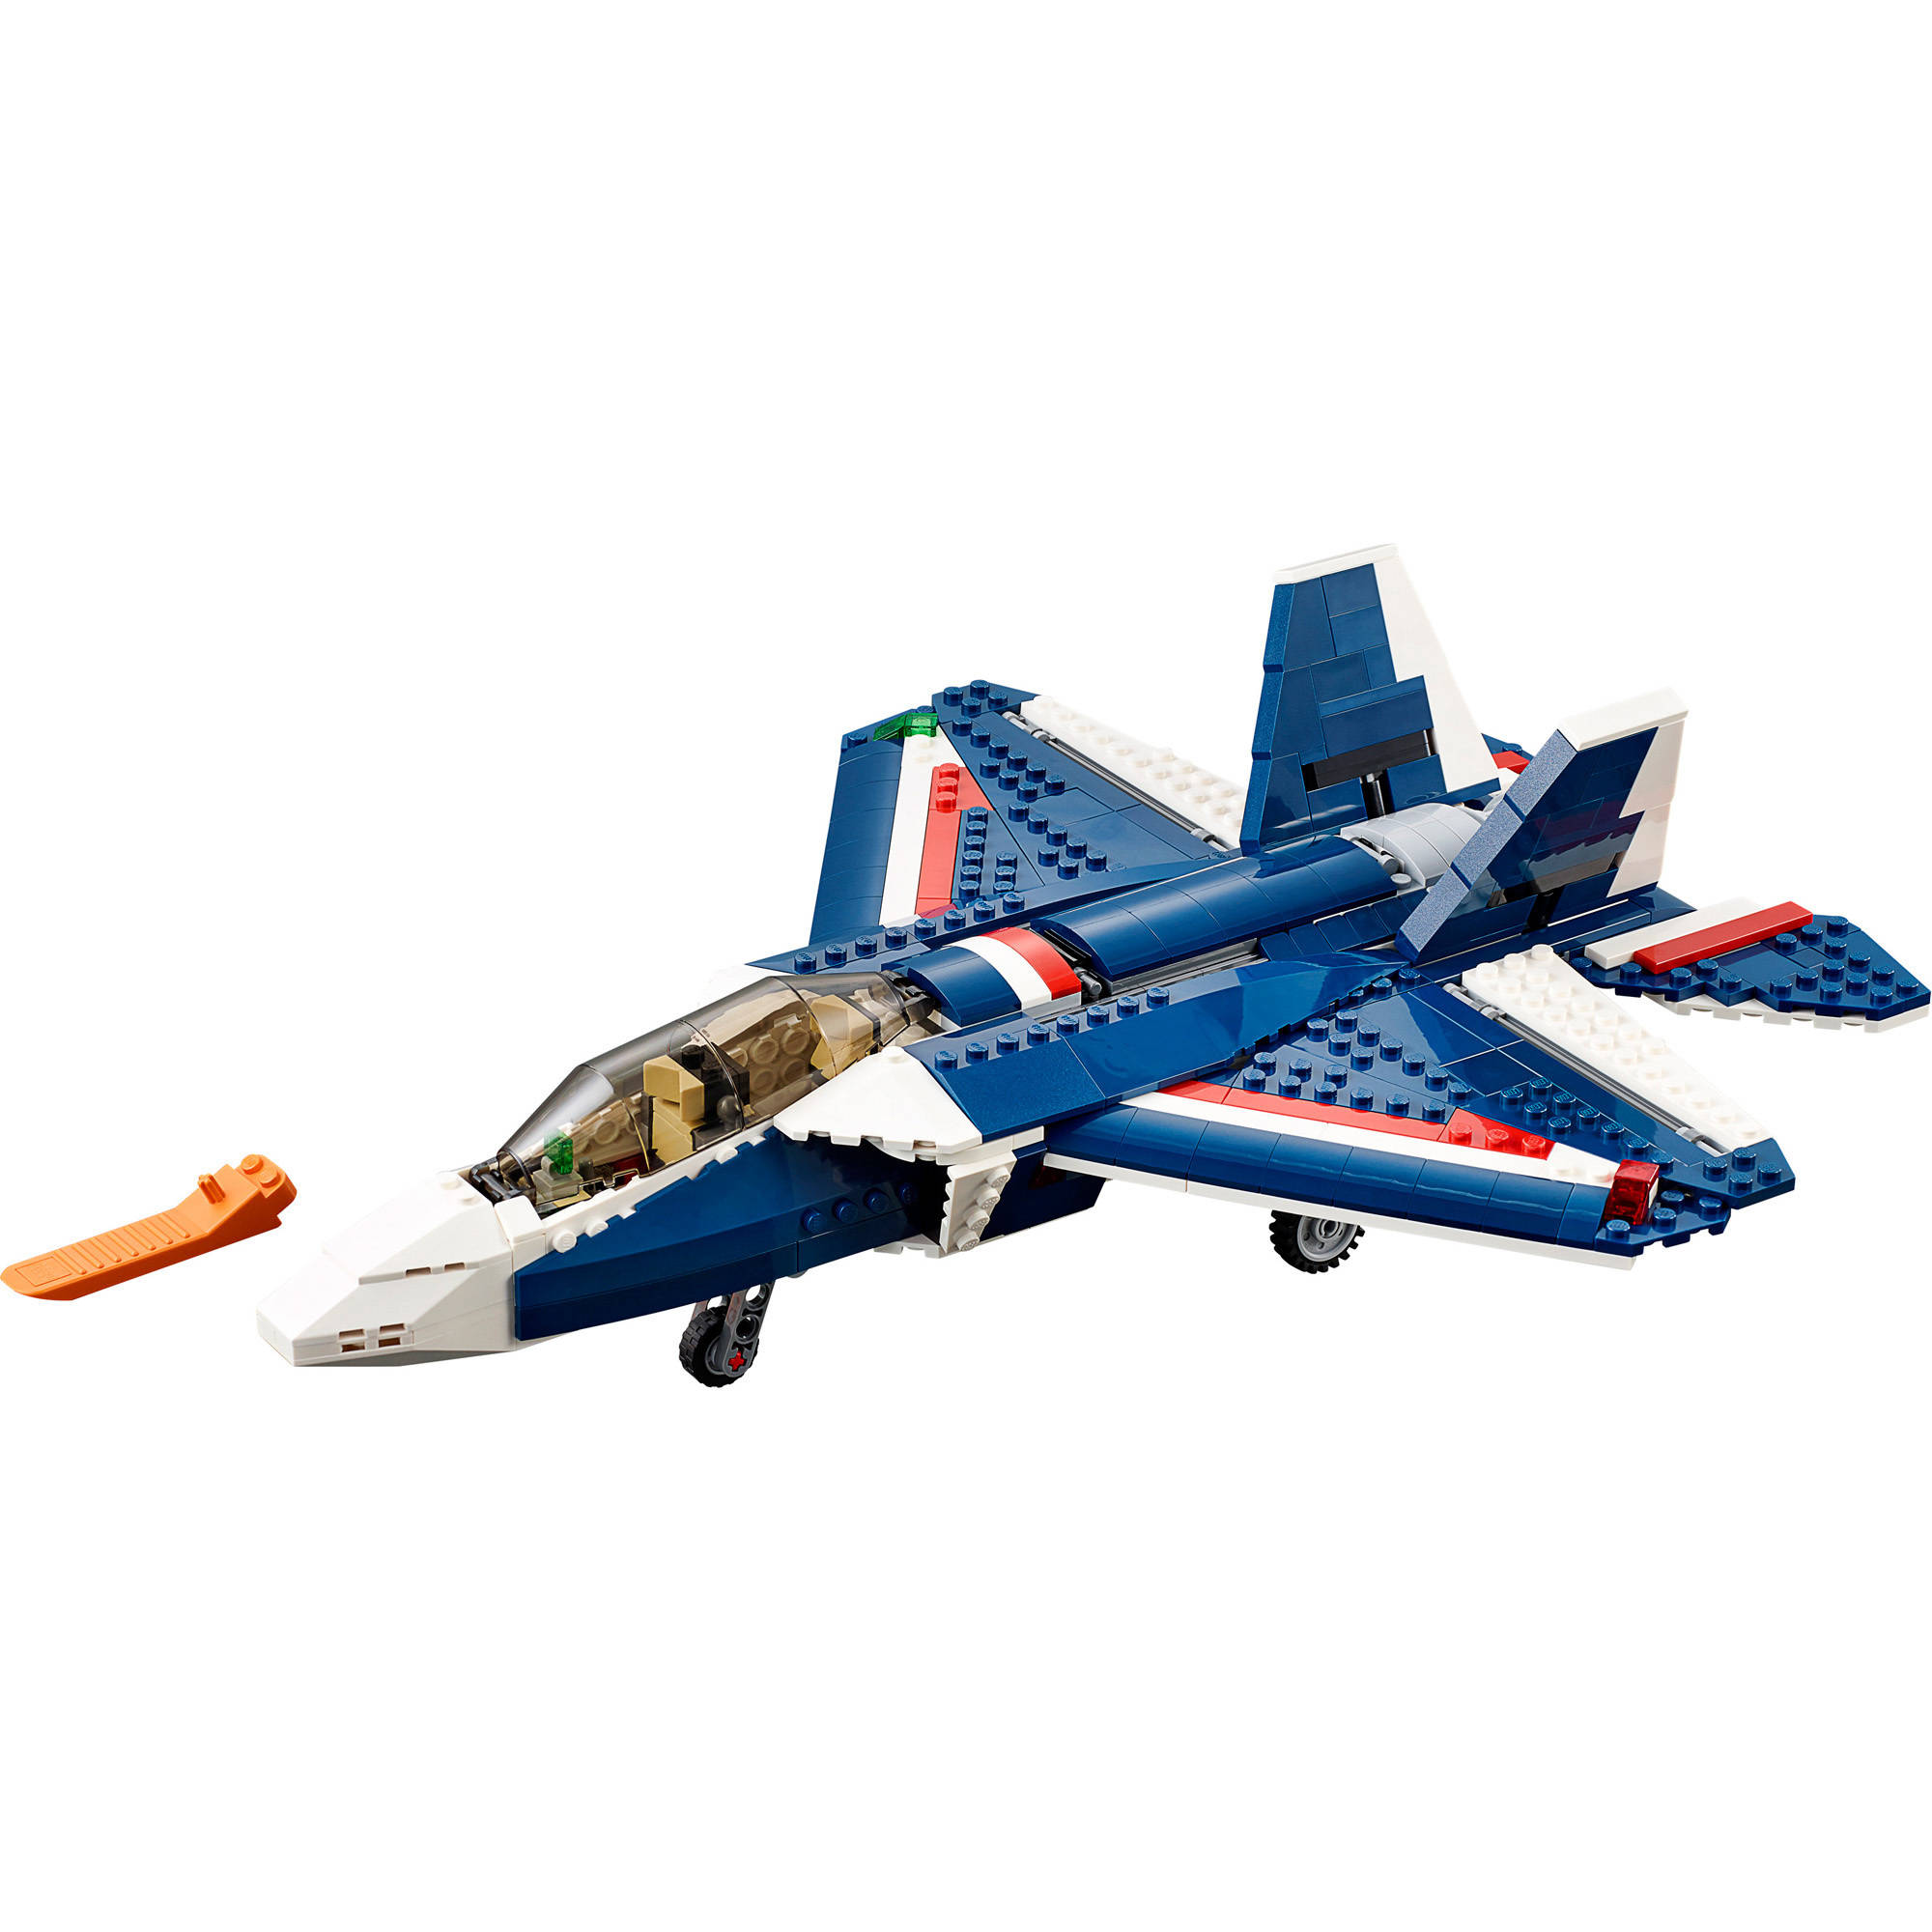 LEGO LEGO Creator Blue Power Jet, 31039